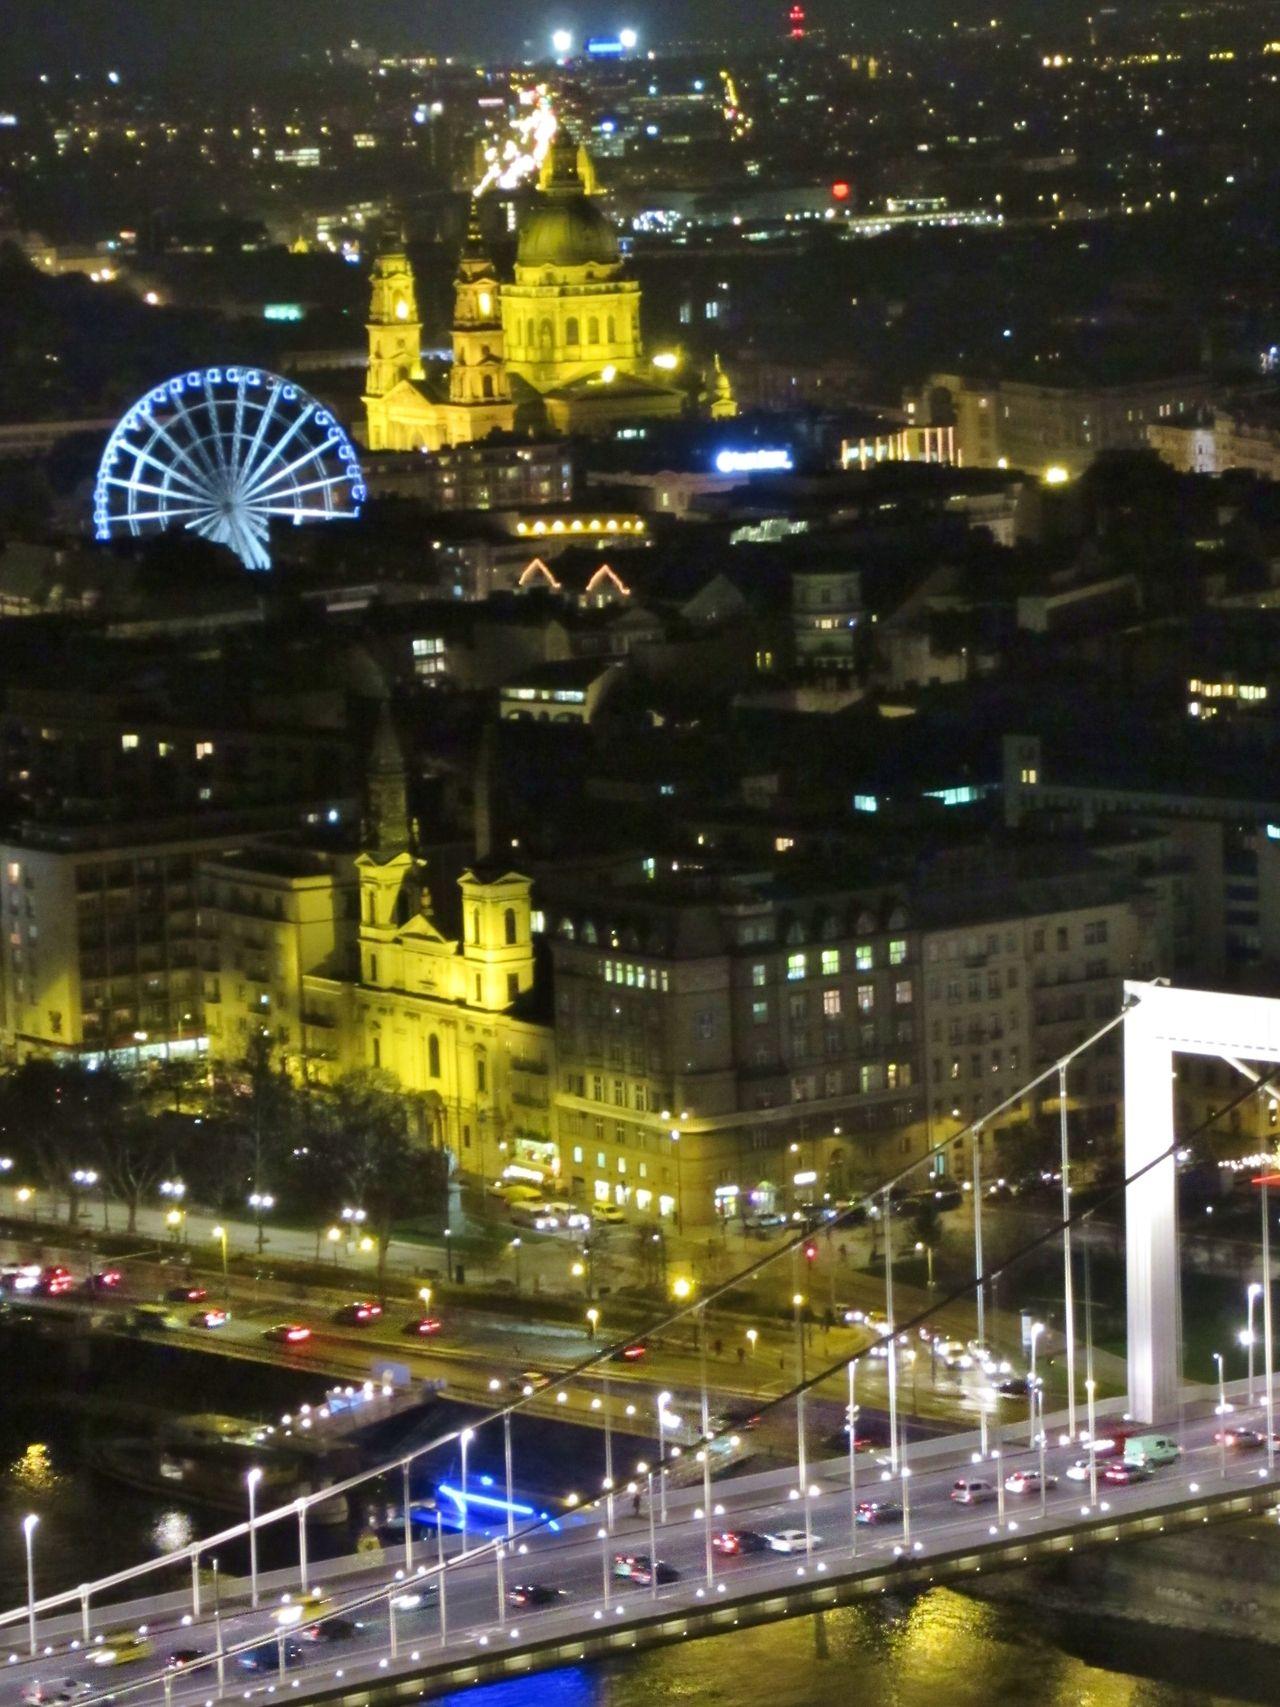 St Stephen Basilica, Ferris Wheel and Elizabeth Bridge at Night, Budapest, Hungary